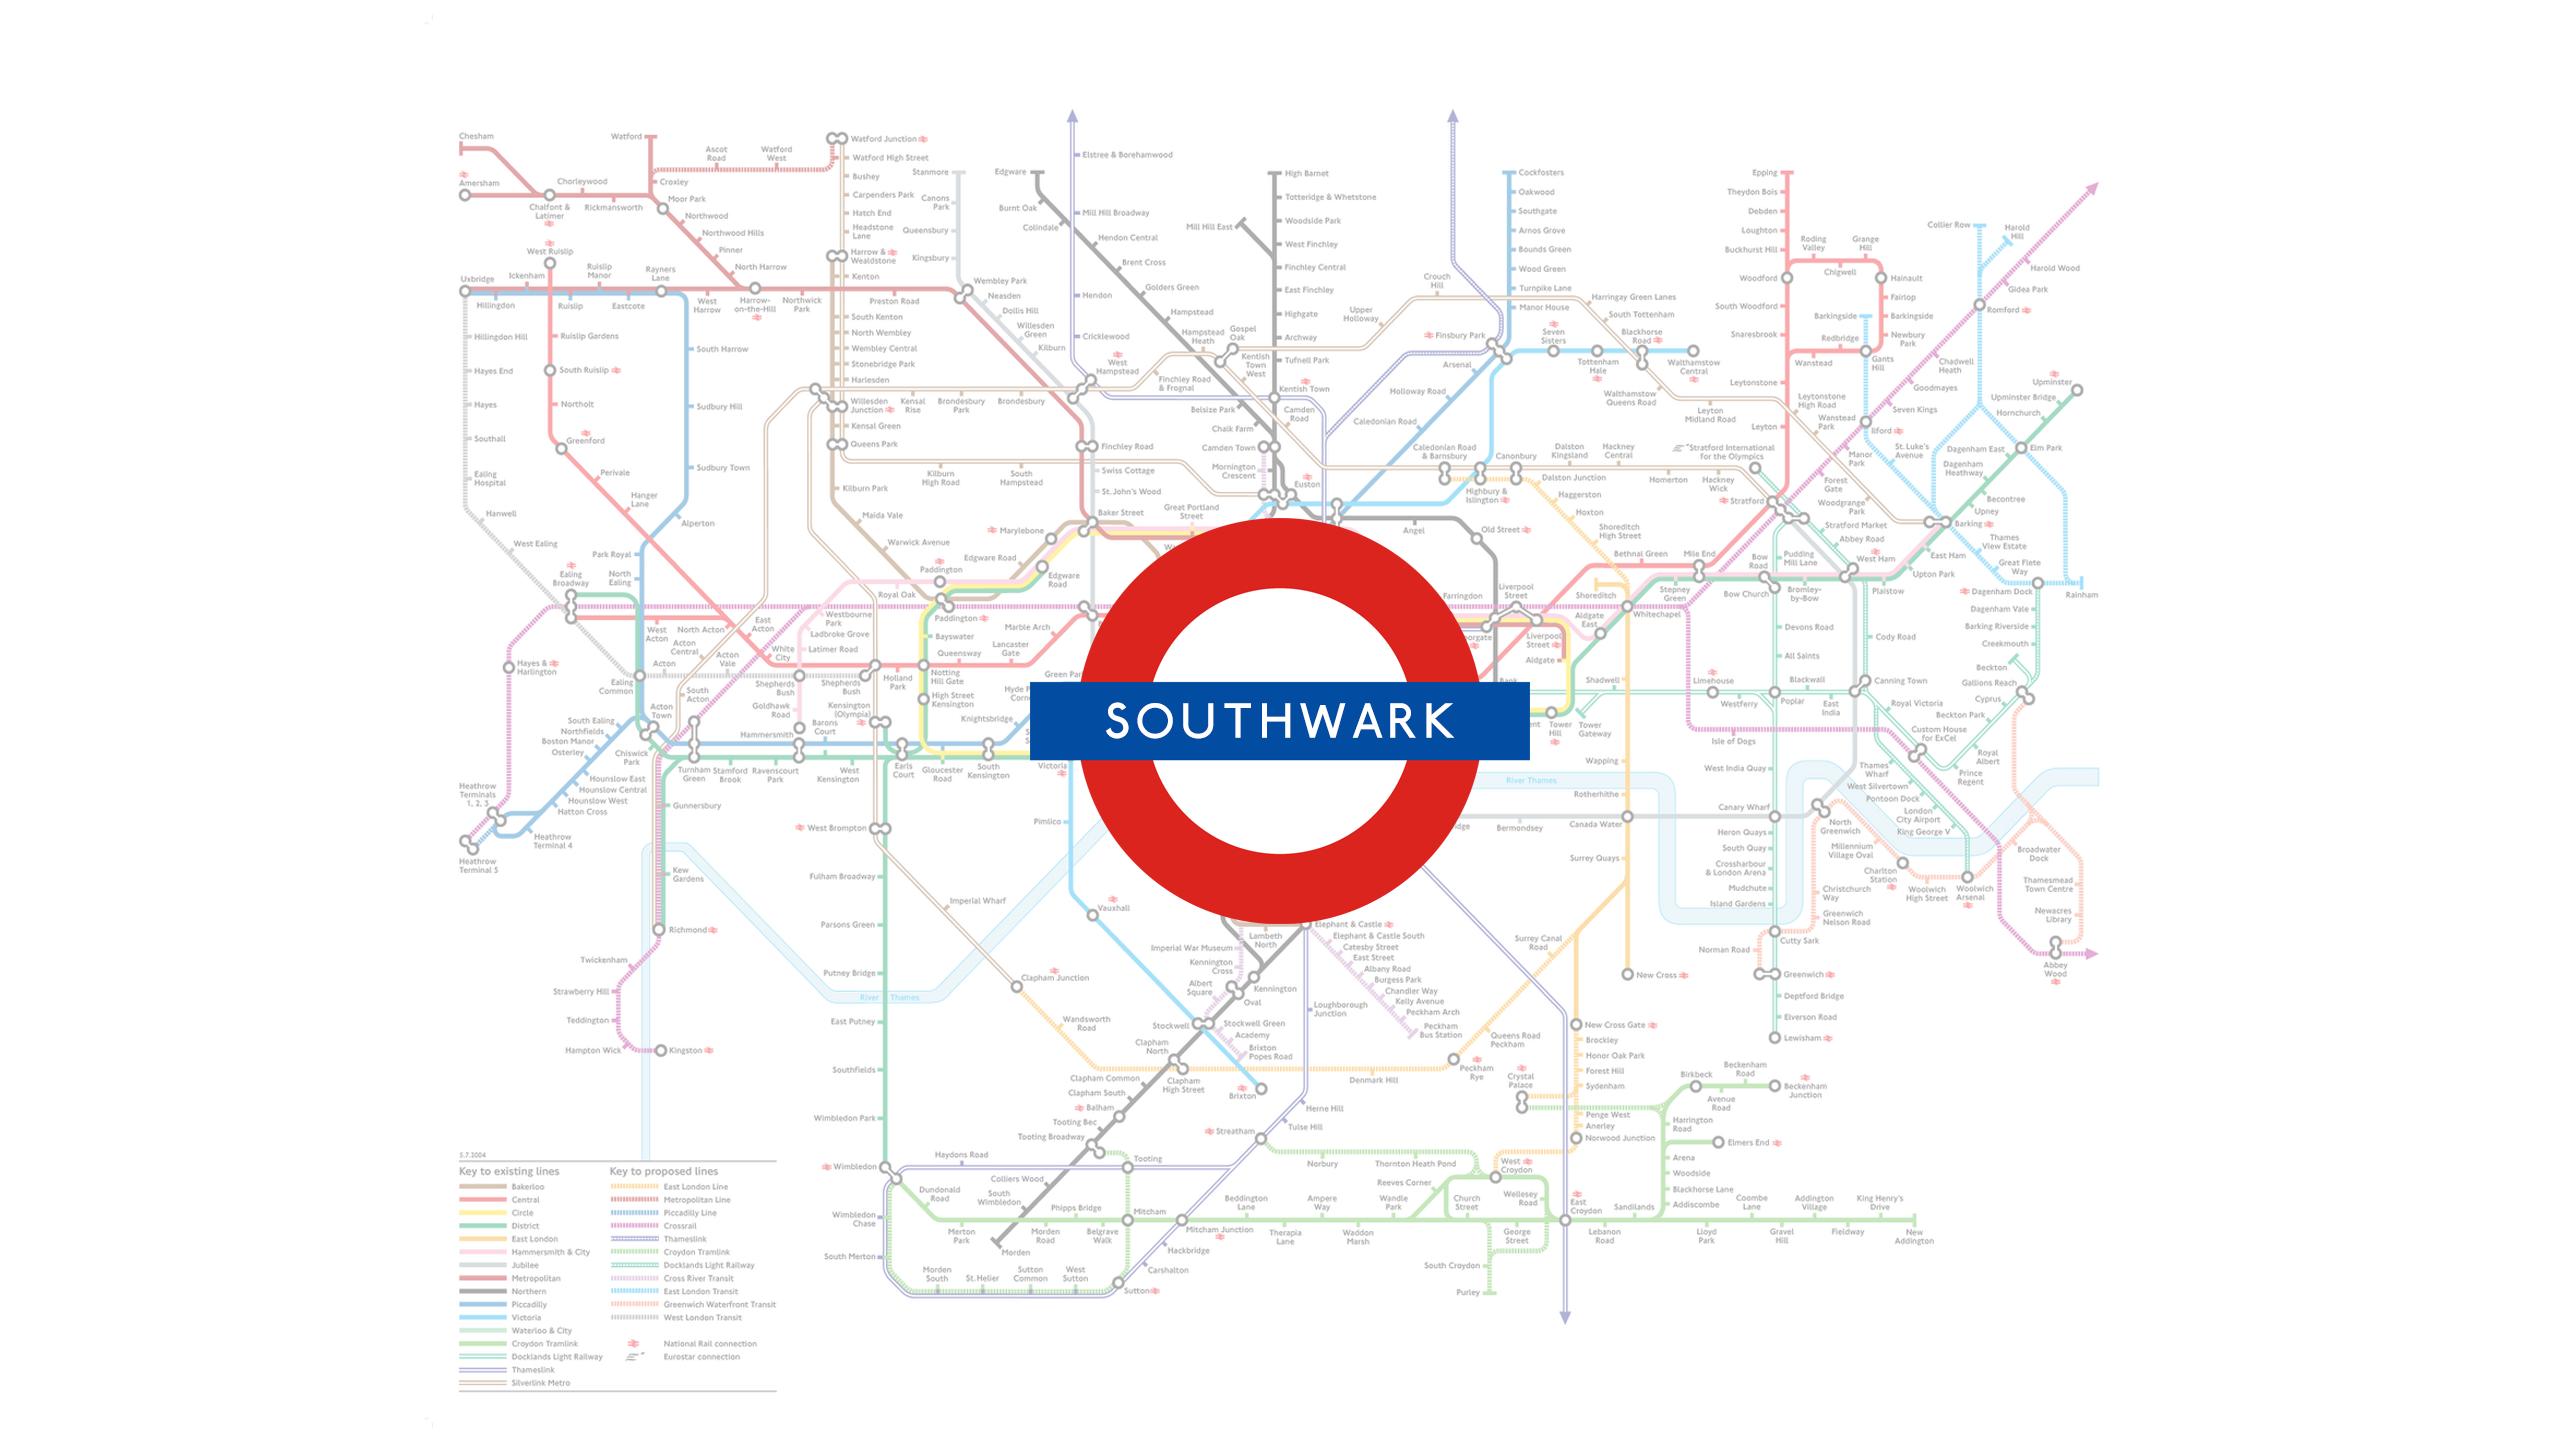 Southwark (Map)